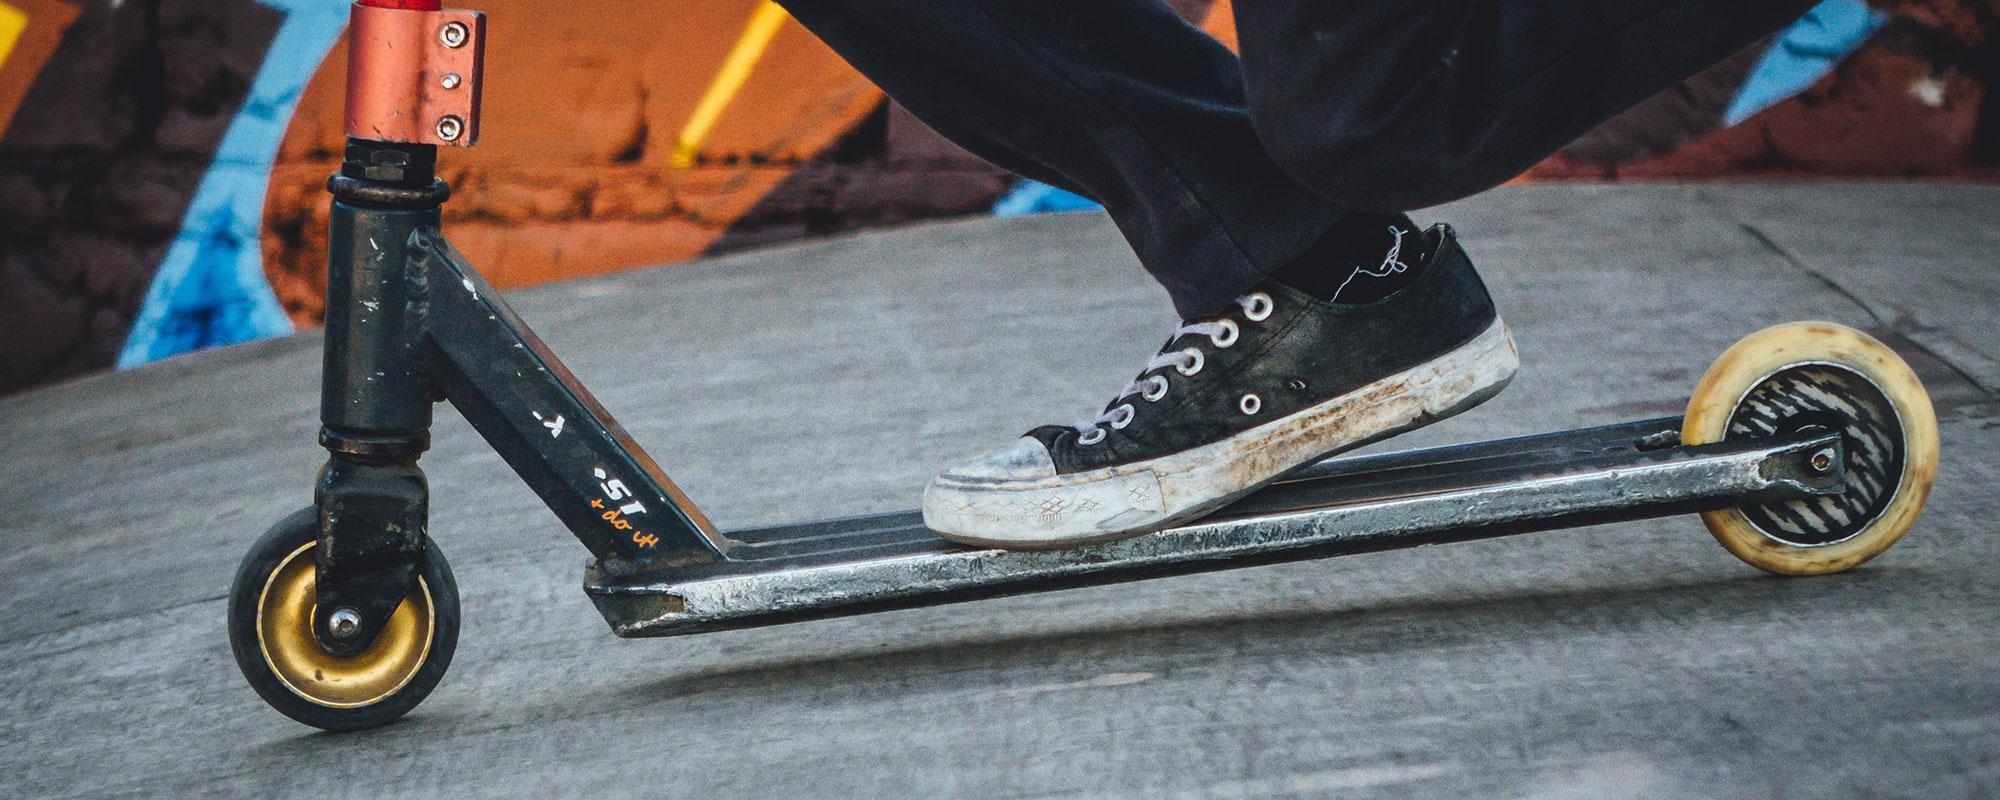 patinetes elétricos